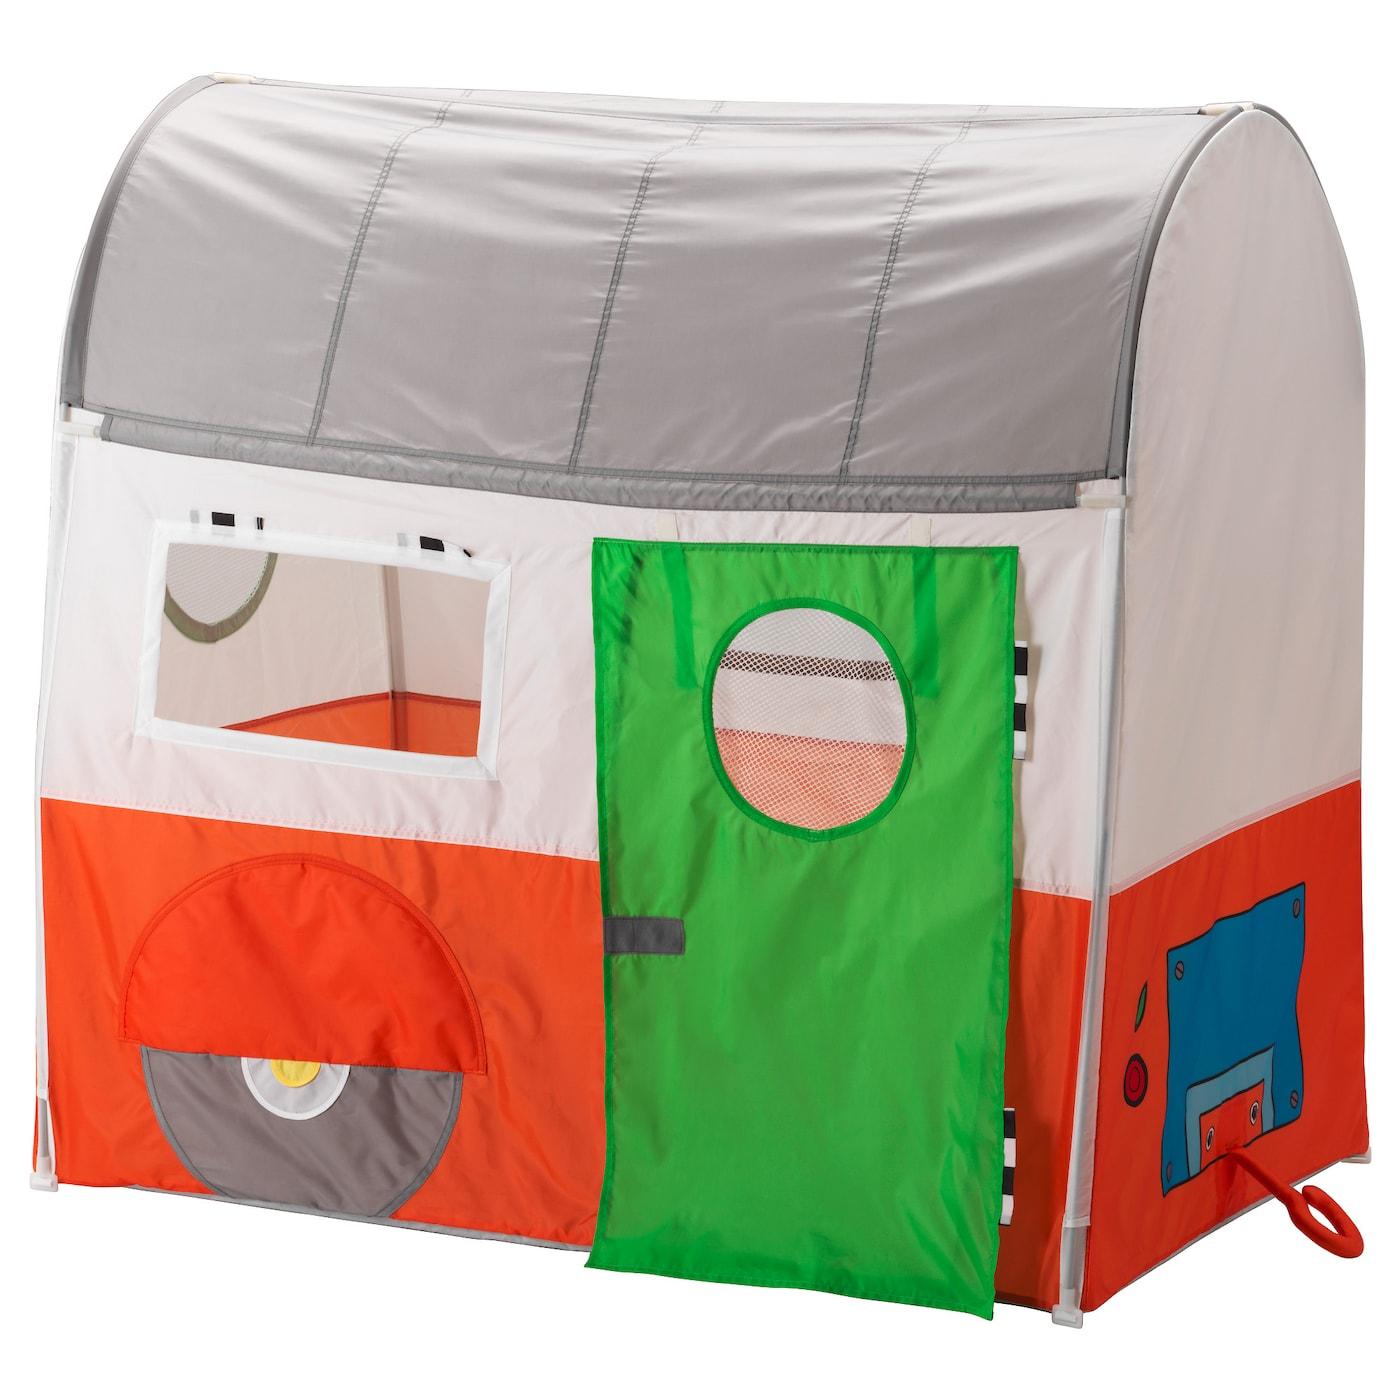 IKEA HEMMAHOS childrenu0027s tent  sc 1 st  Ikea & Play Tents - Kids Tents - IKEA